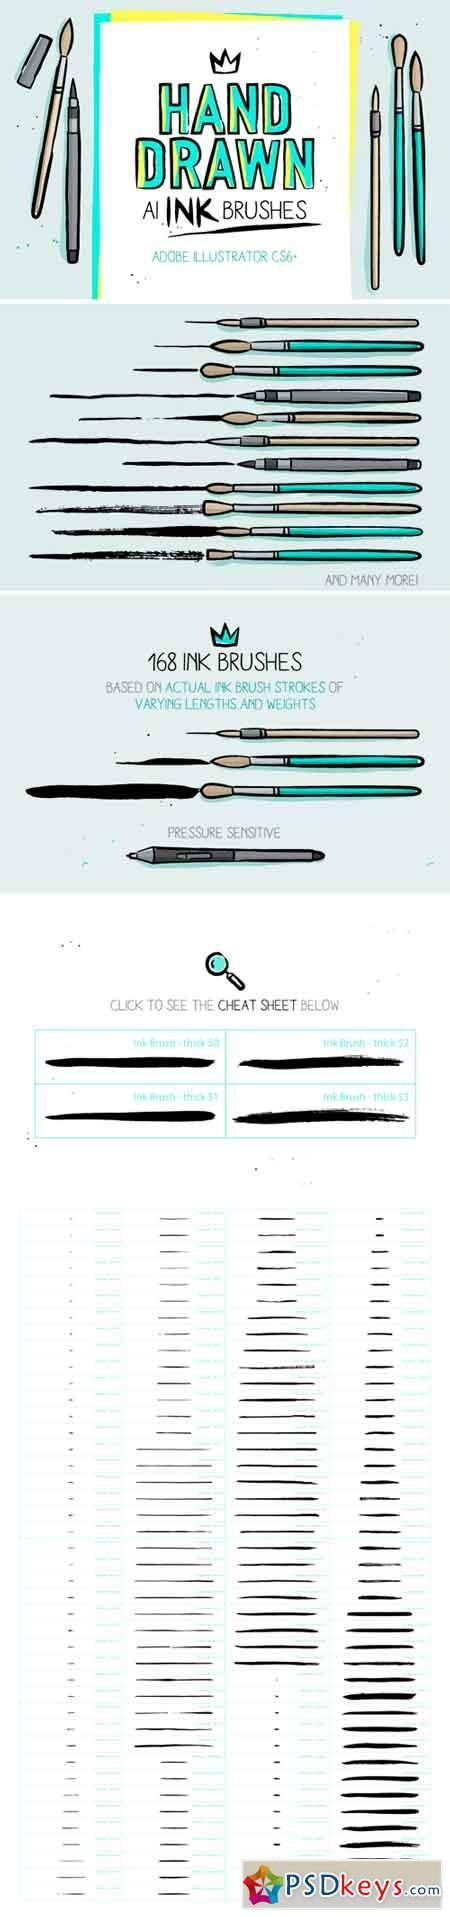 adobe illustrator cs6 brushes 168 illustrator ink brushes 514227 187 free download